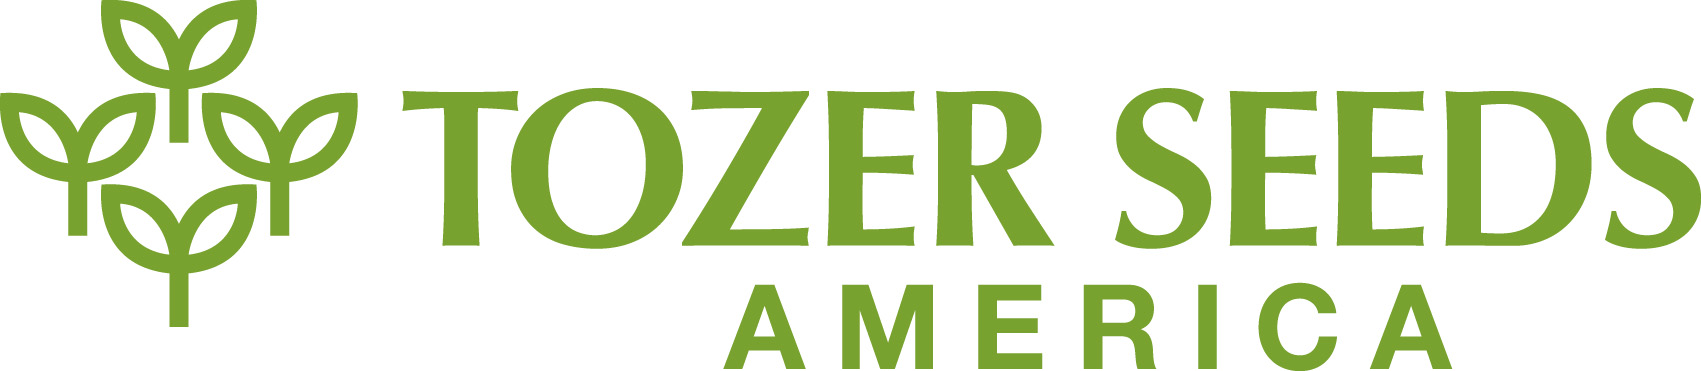 Tozer Seeds America